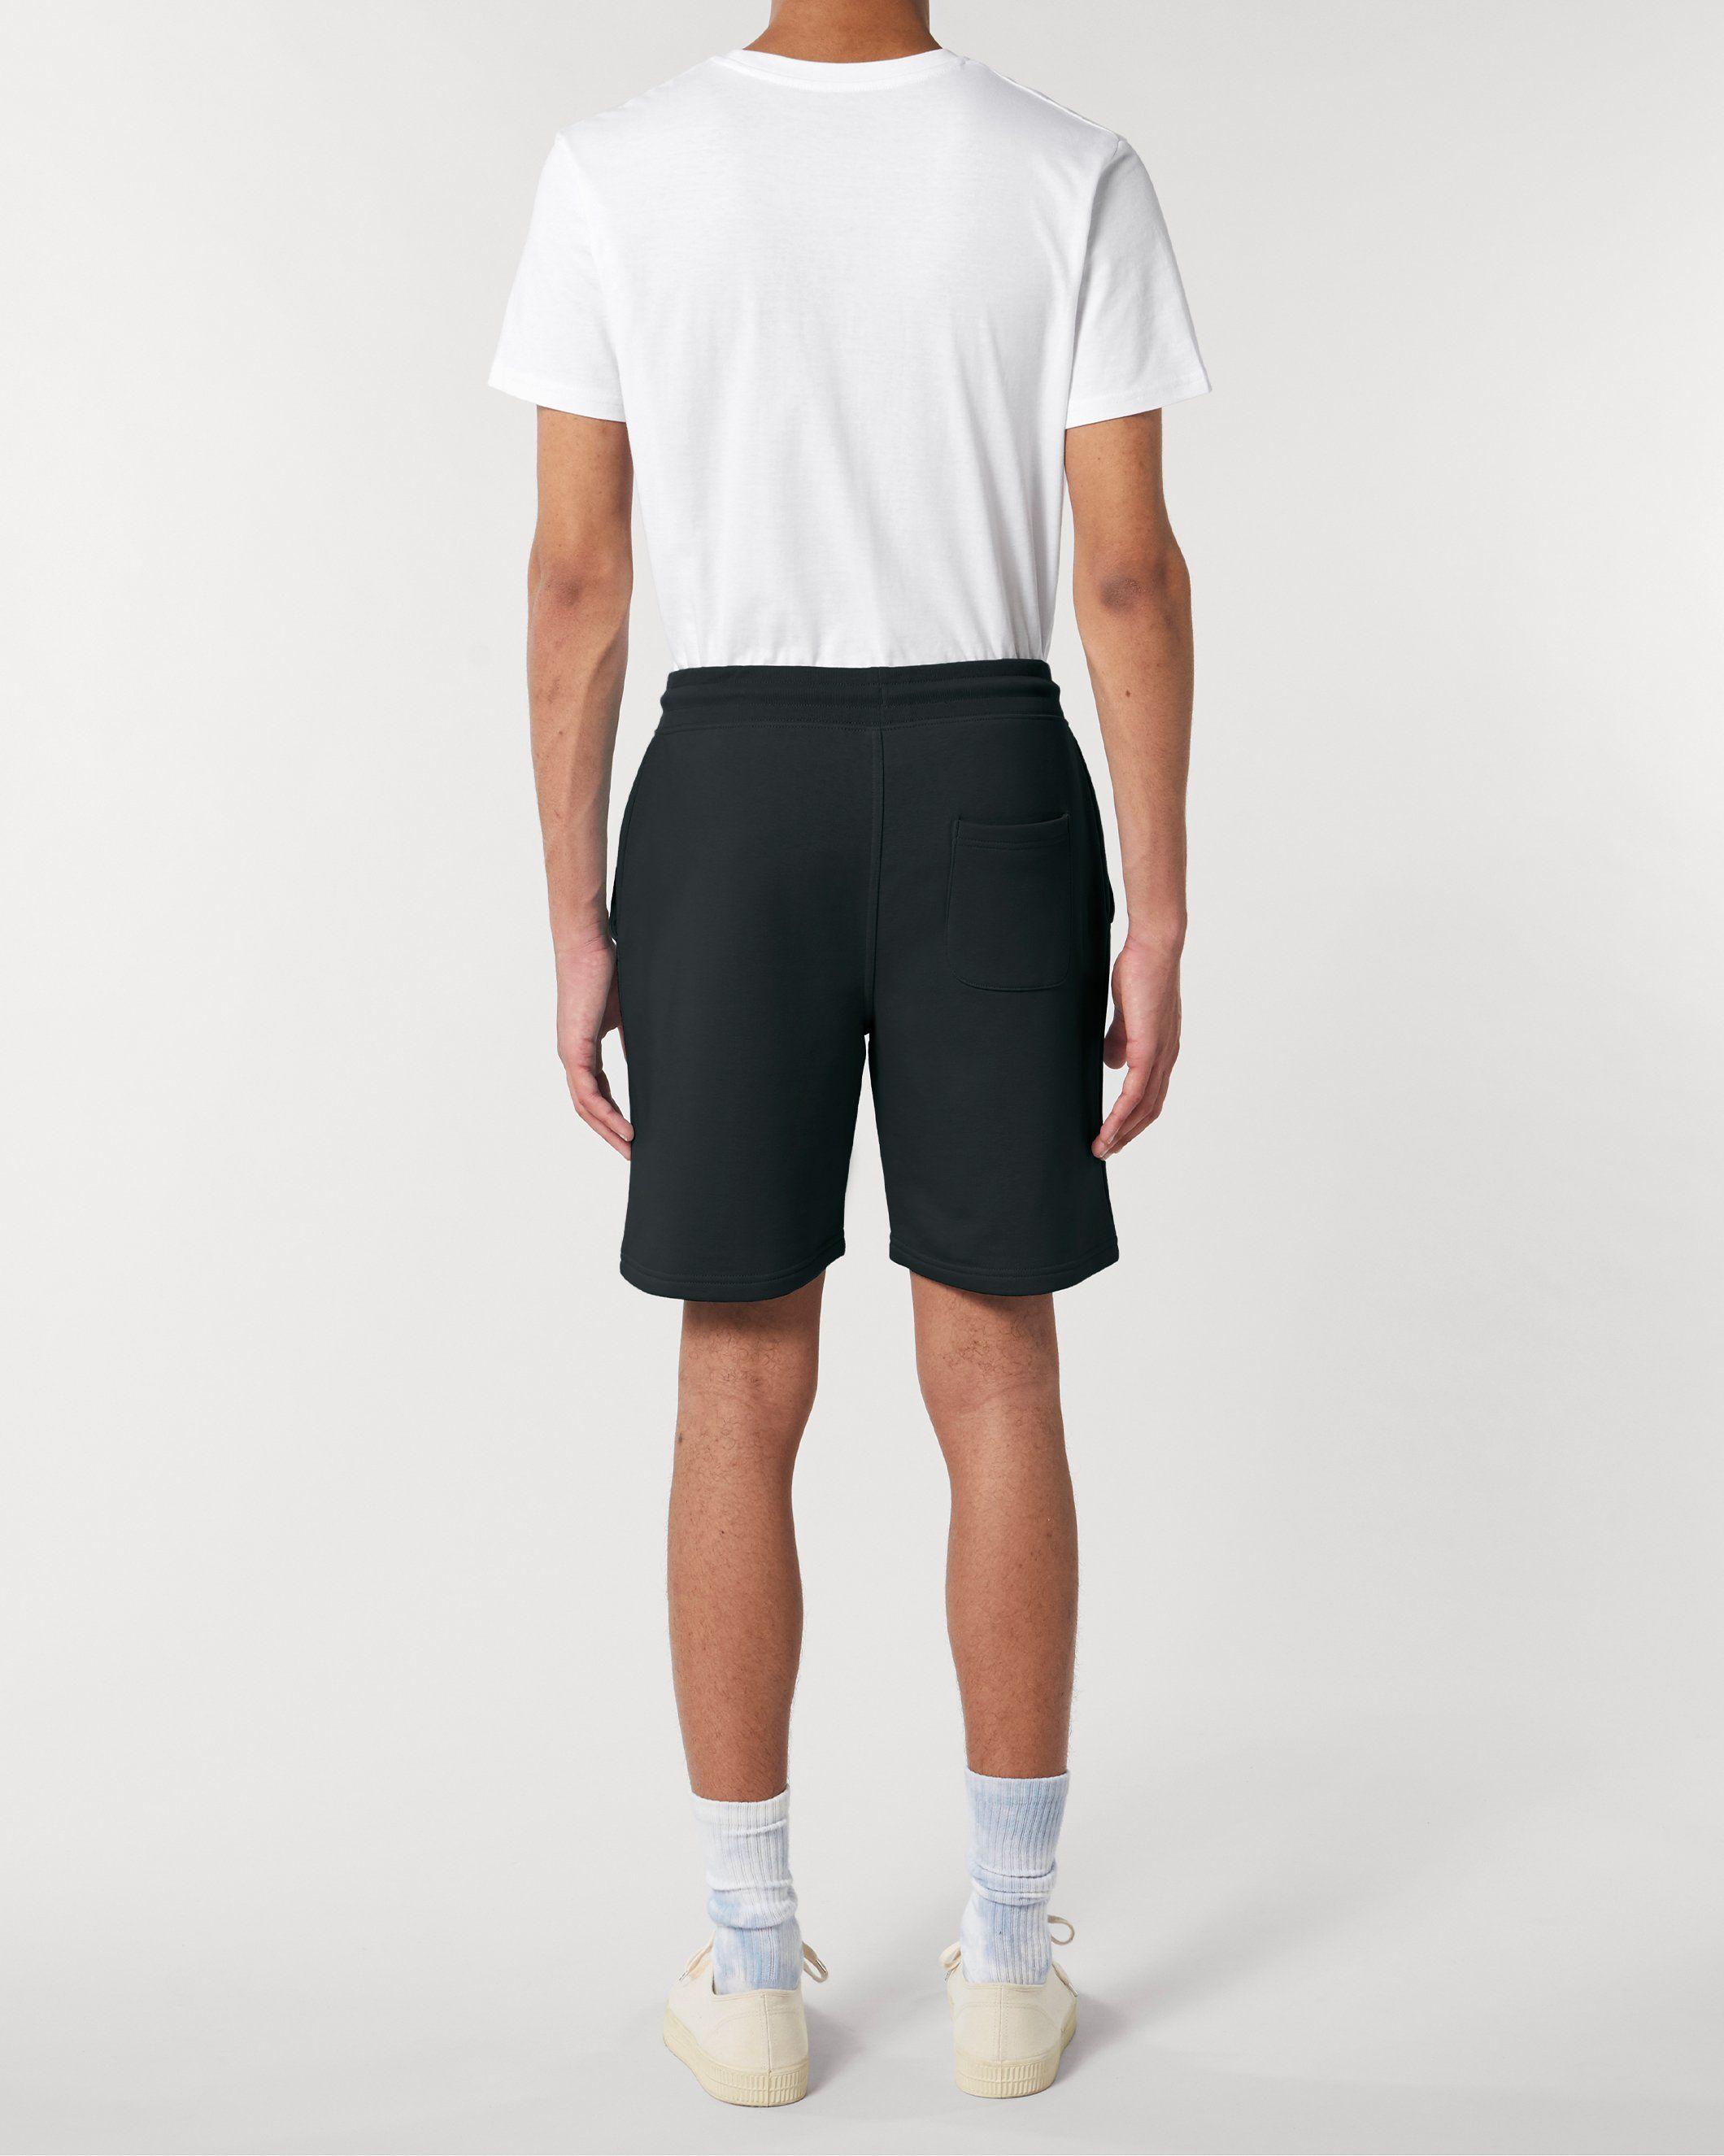 Vayu Unisex Jogger Shorts in Black